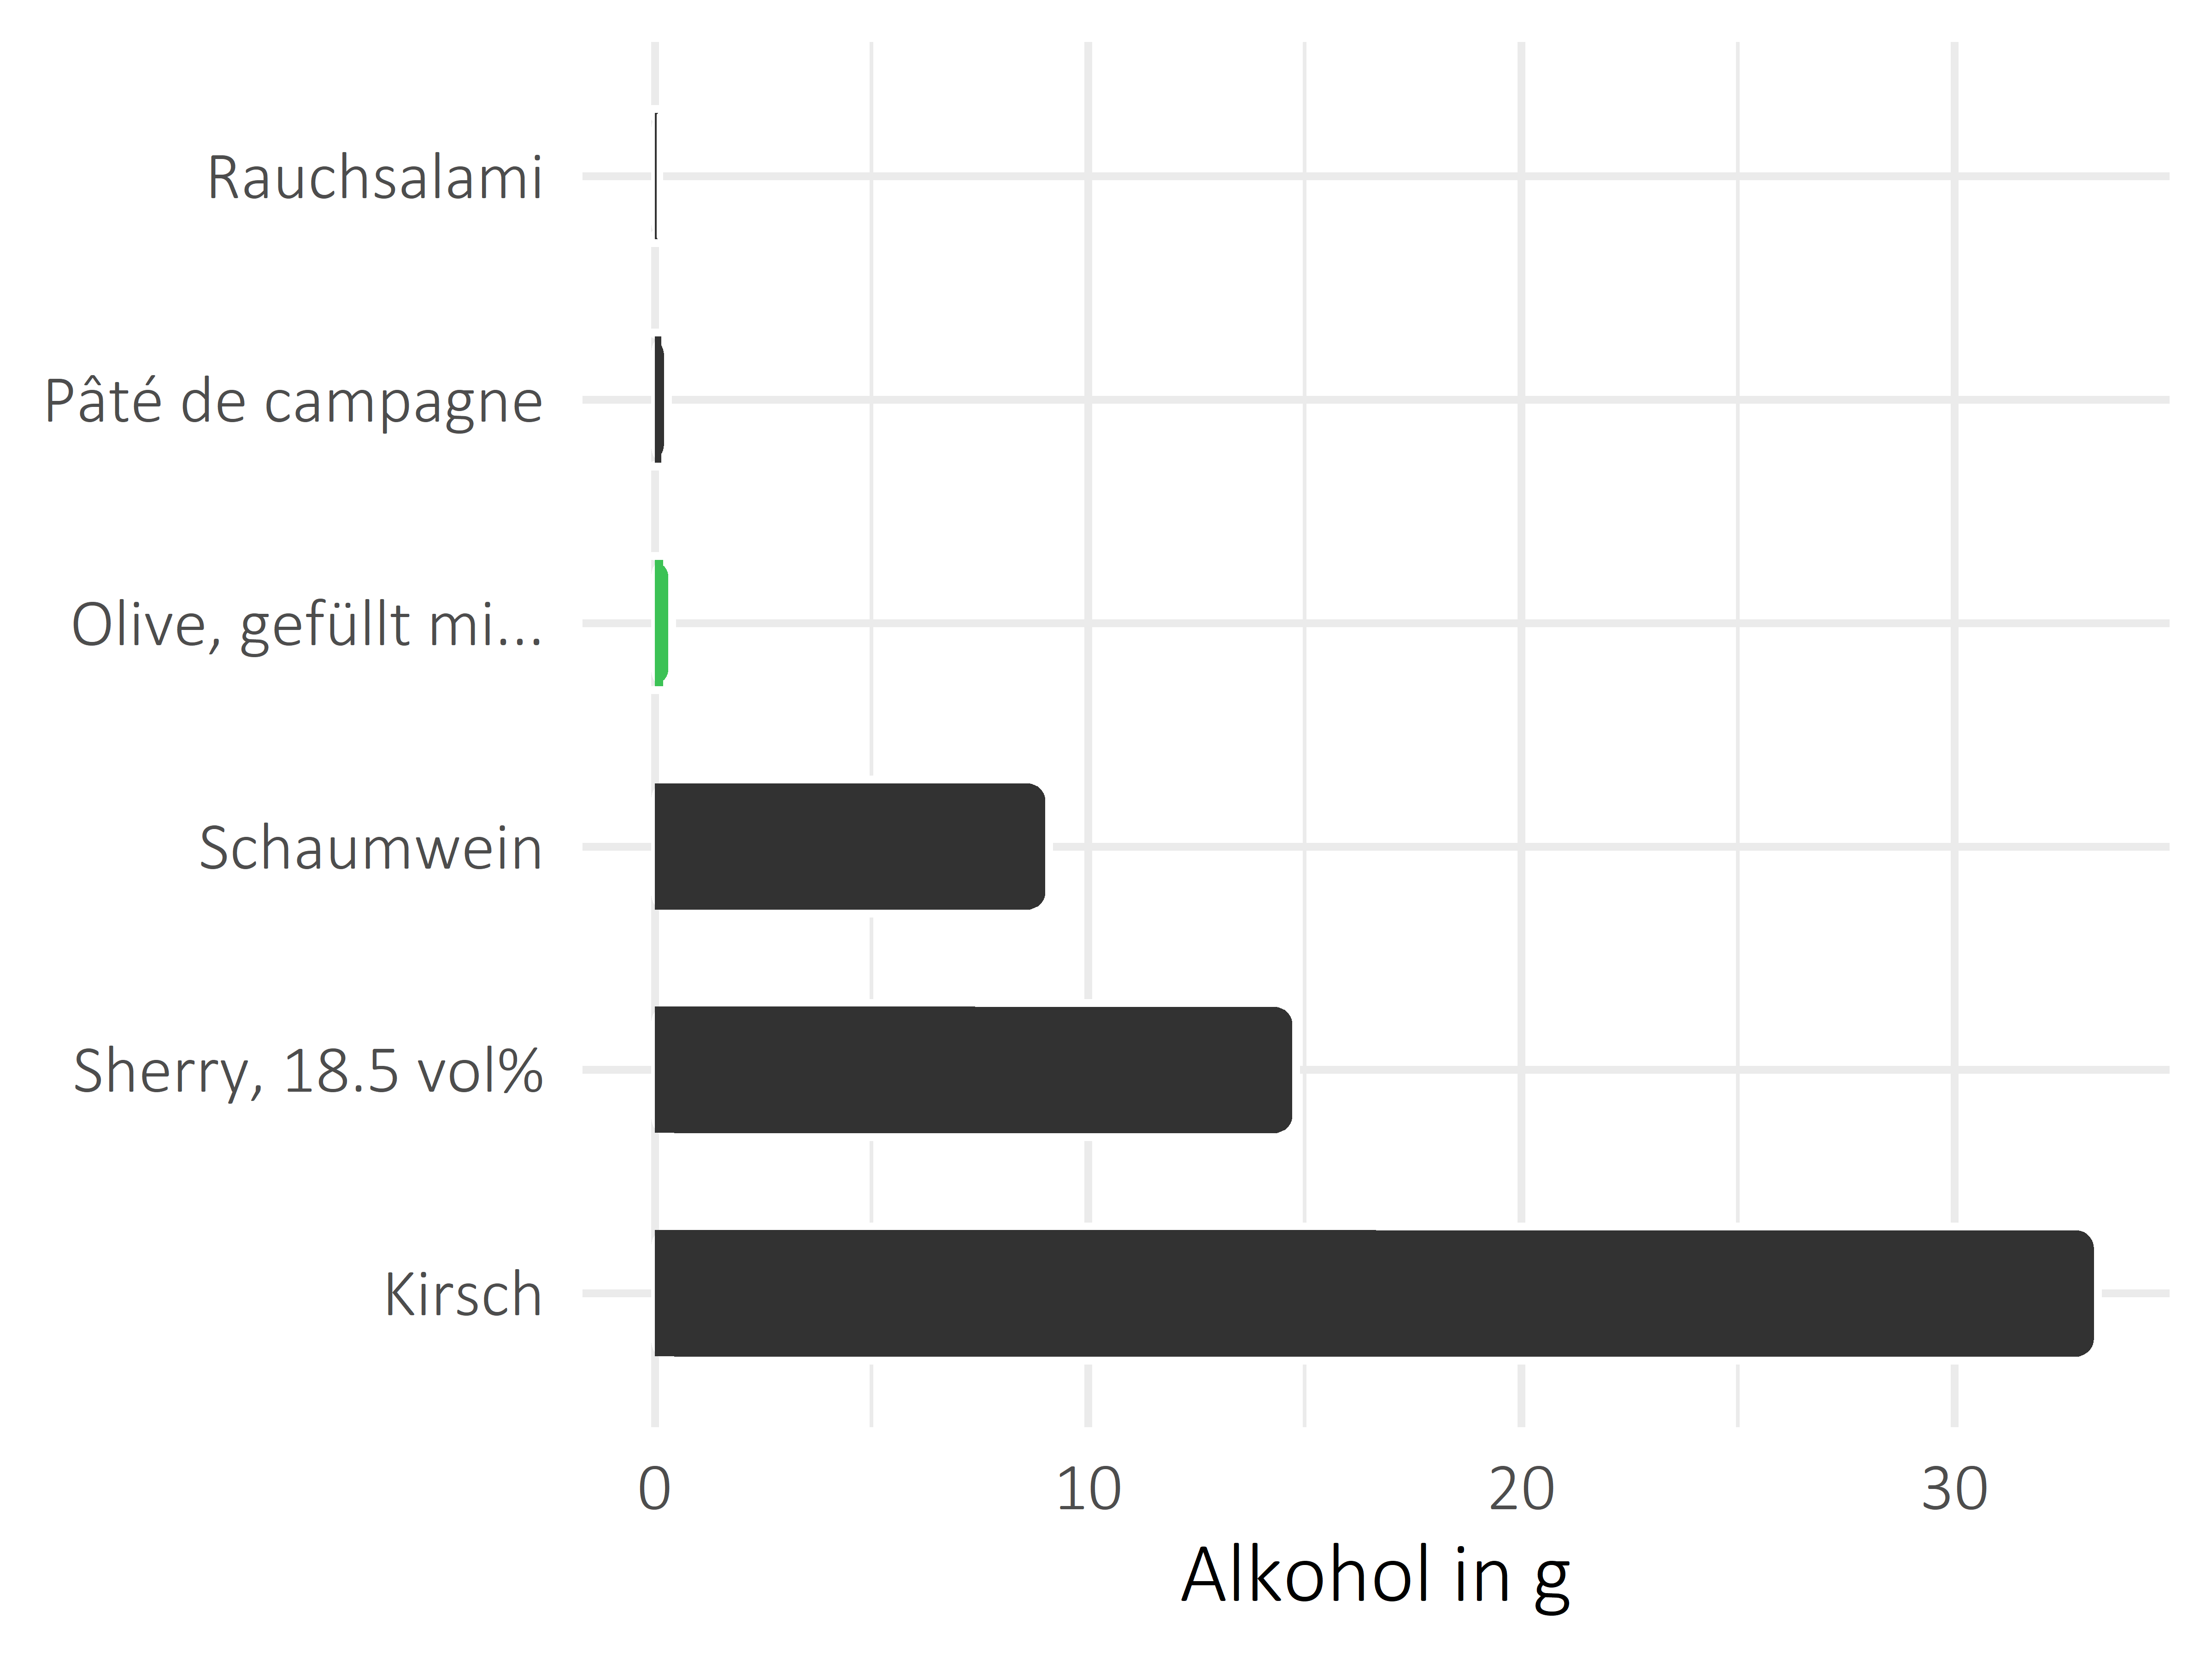 salzige Snacks Alkohol